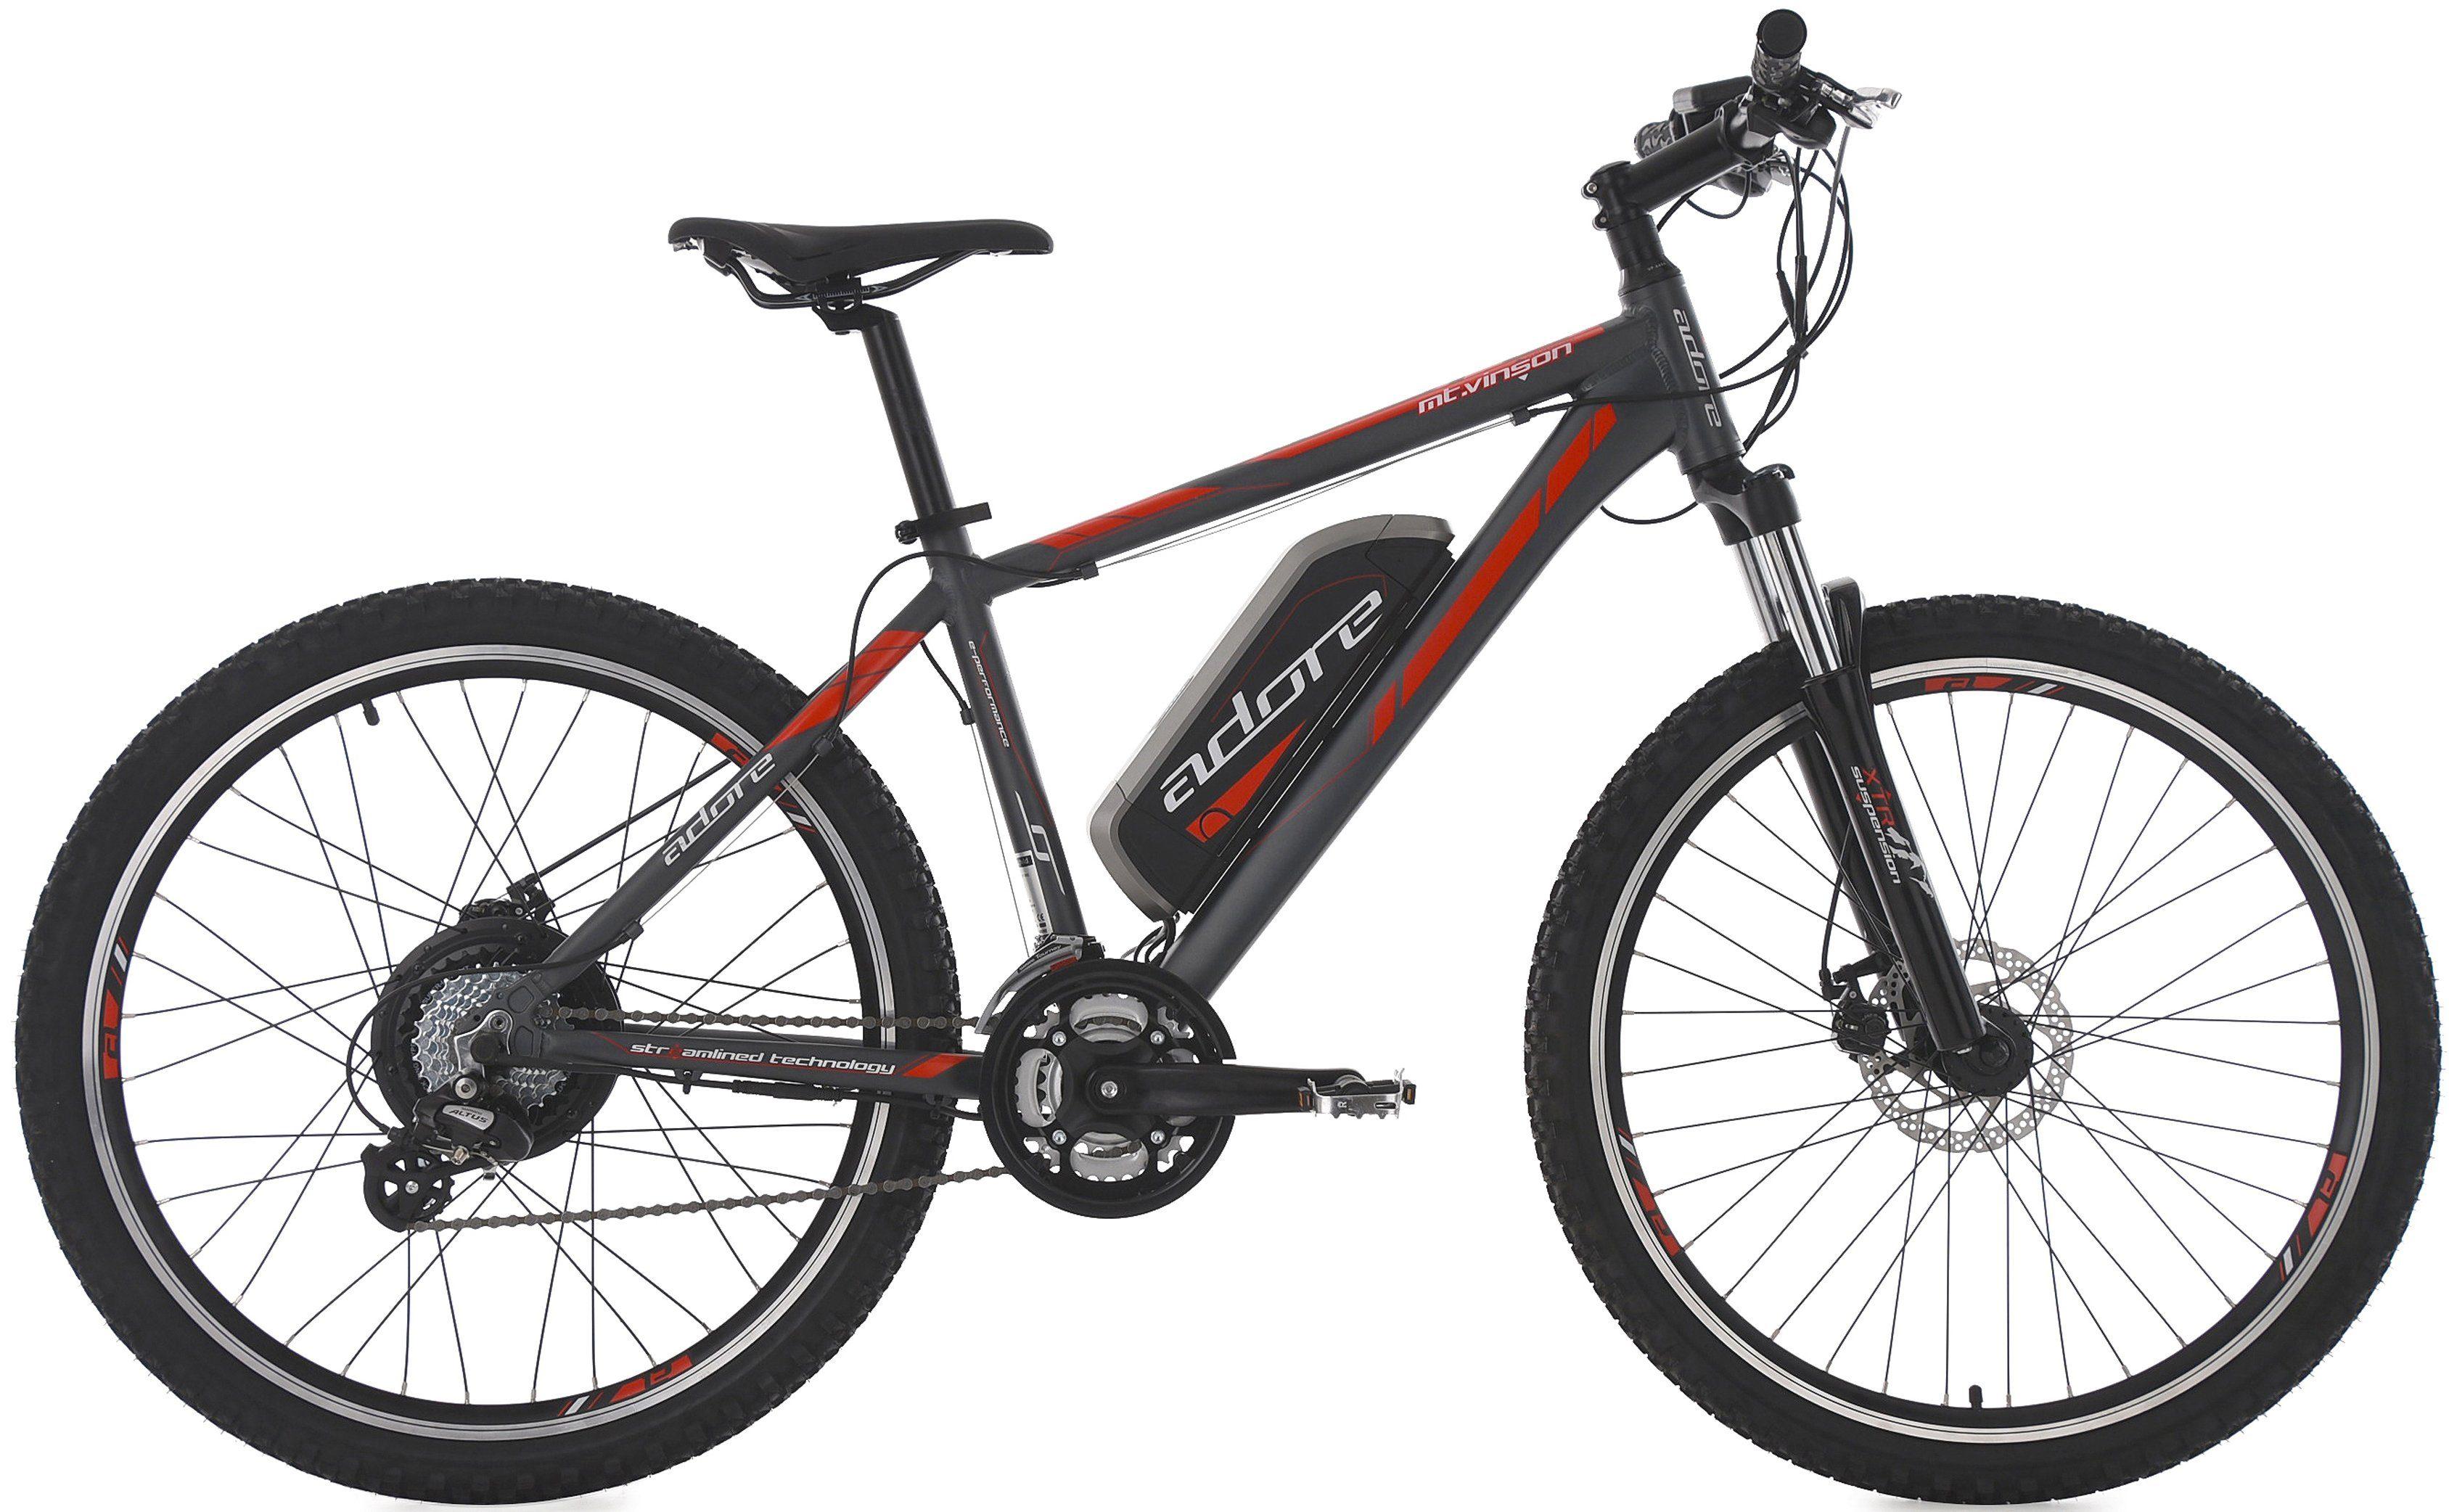 Adore MTB E-Bike, 26 Zoll, 24 Gang Shimano Altus, Hinterradmotor, 374 W, 36V/10,4 Ah, »Vinson«